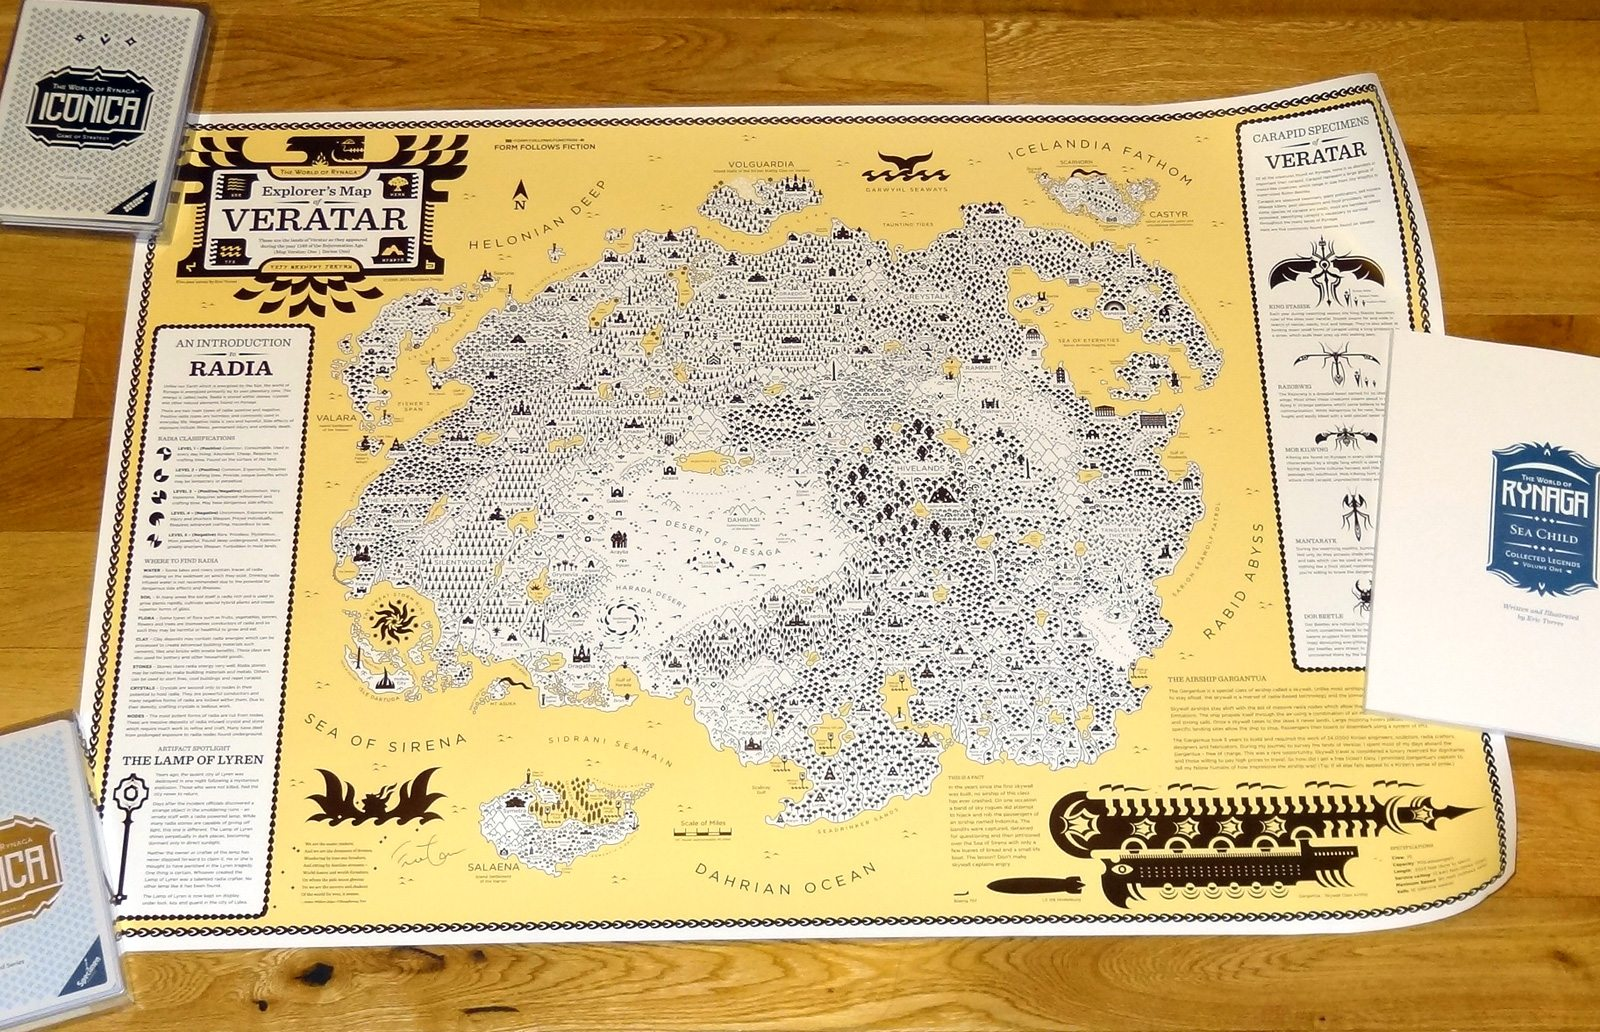 World of Rynaga - Veratar Map